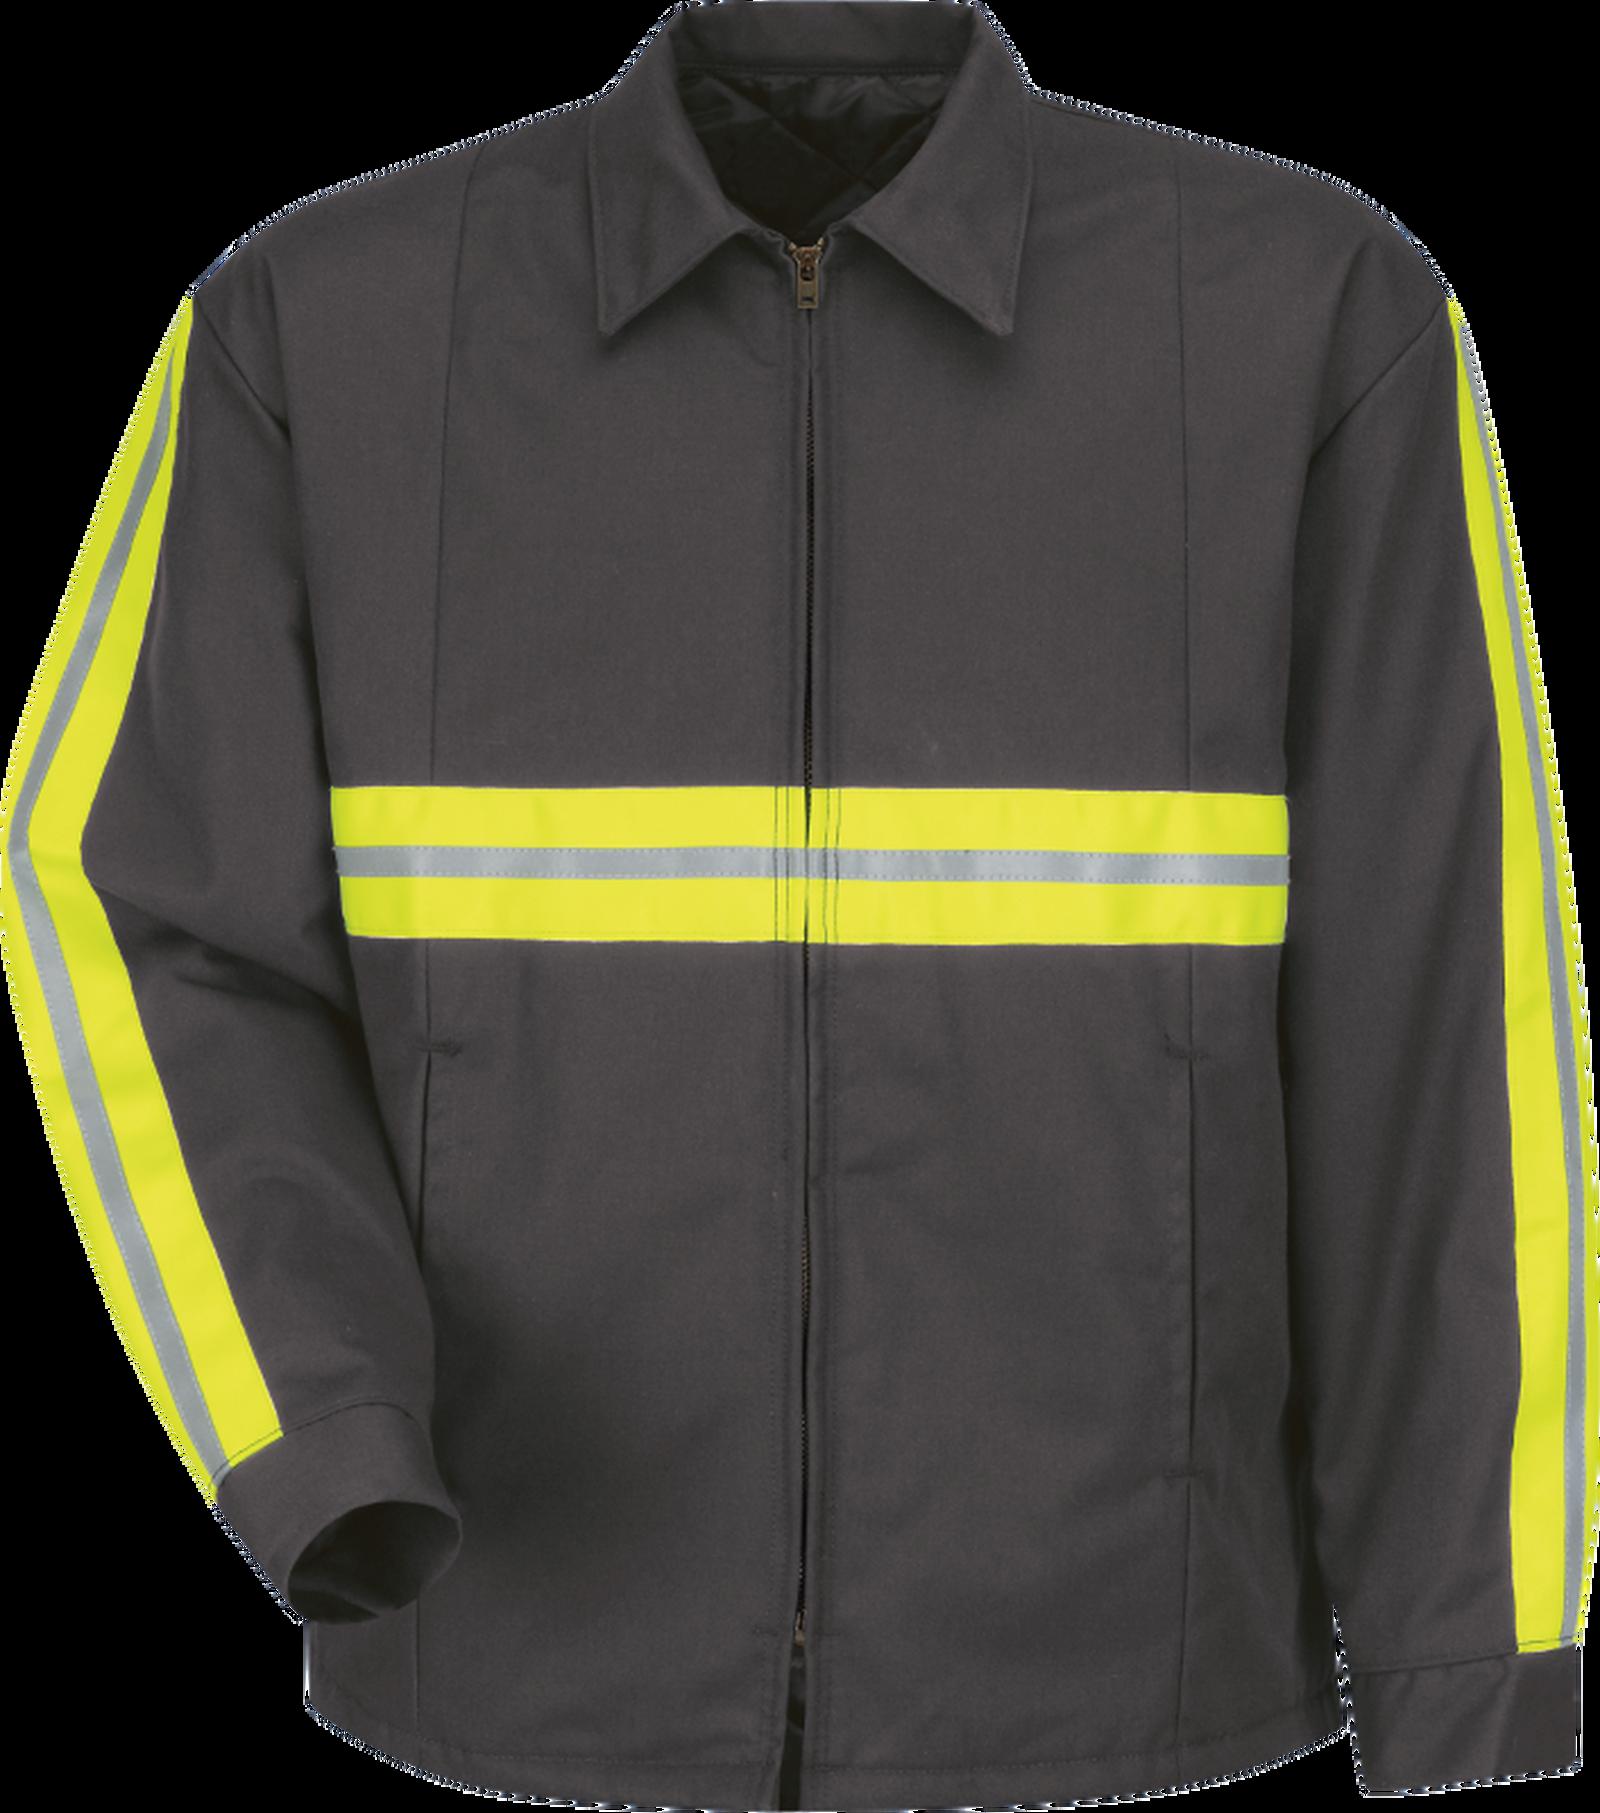 Men's Enhanced Visibility Perma-Lined Panel Jacket